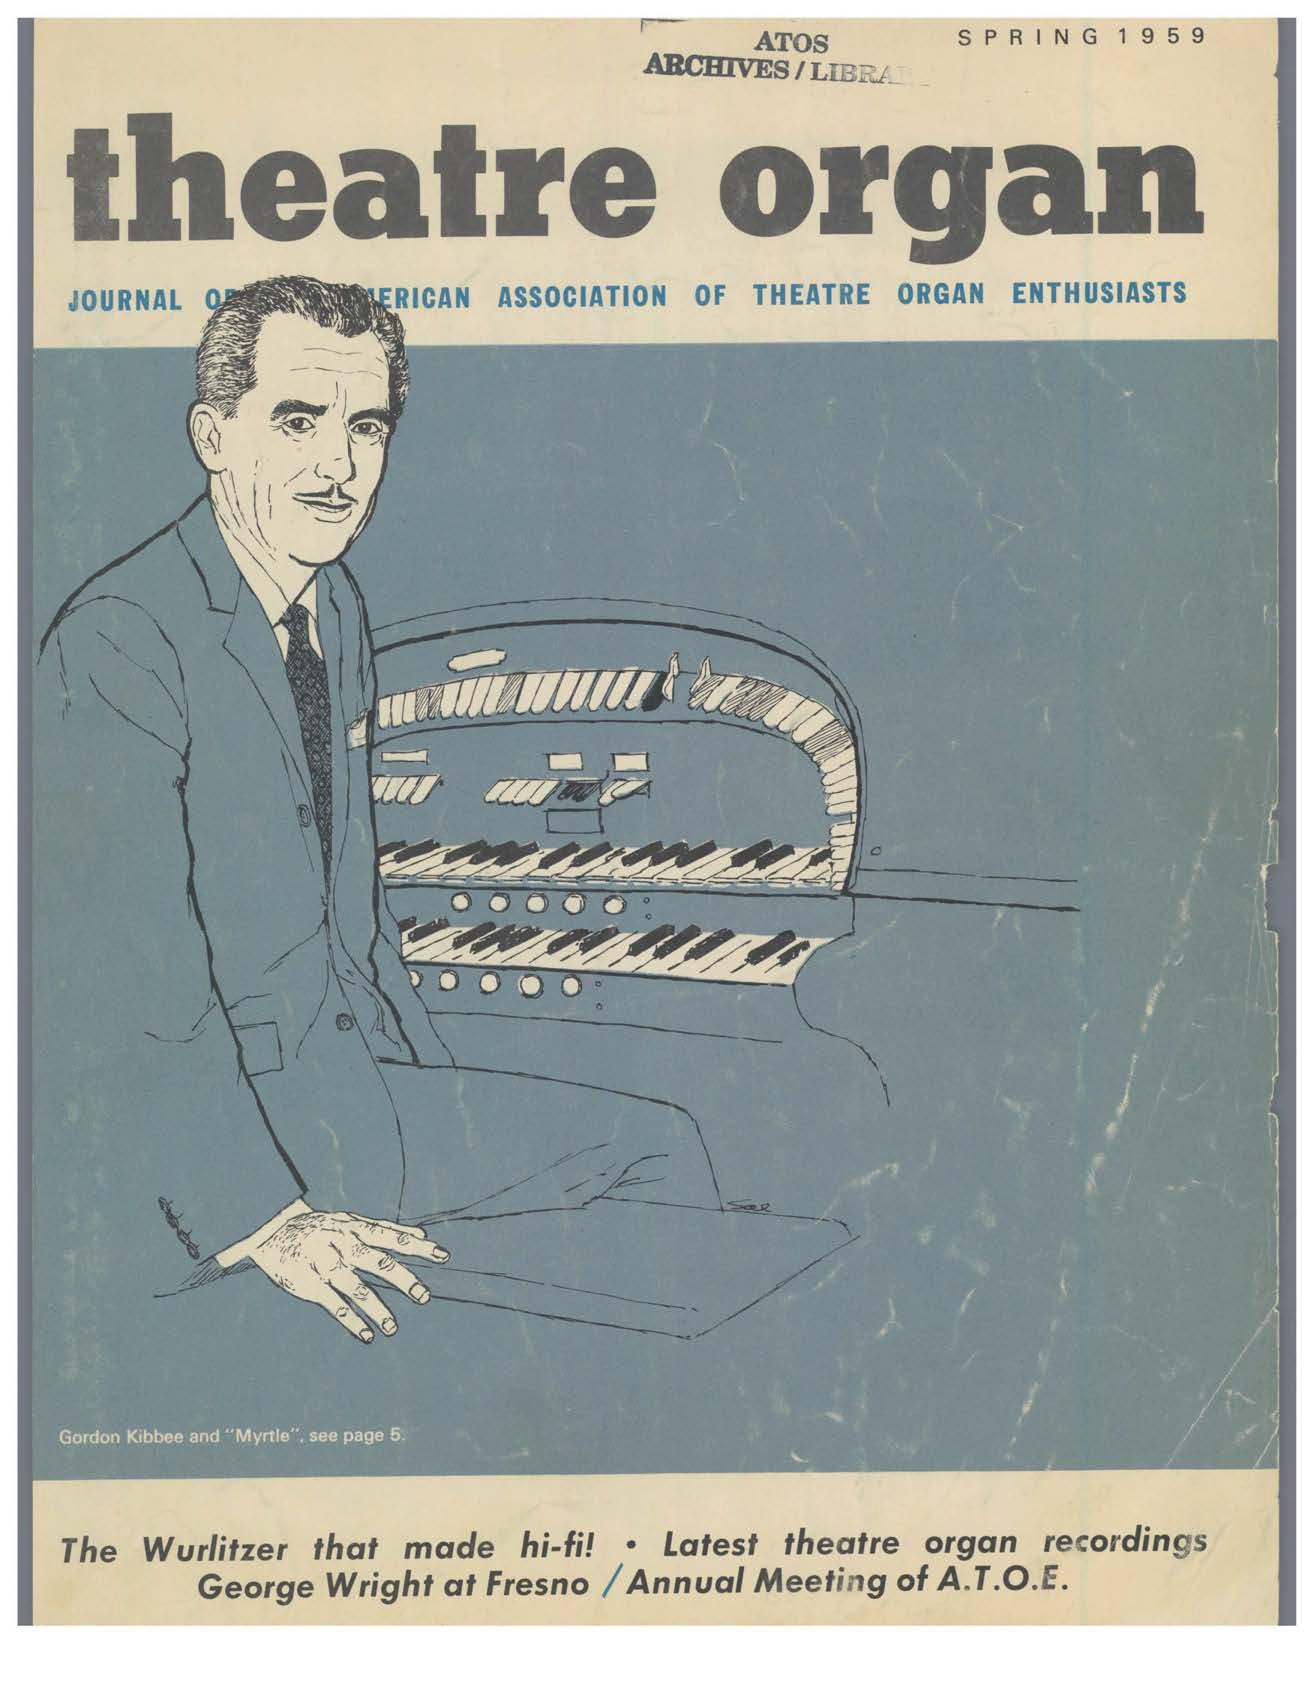 Theatre Organ, Spring 1959, Volume 1, Number 1